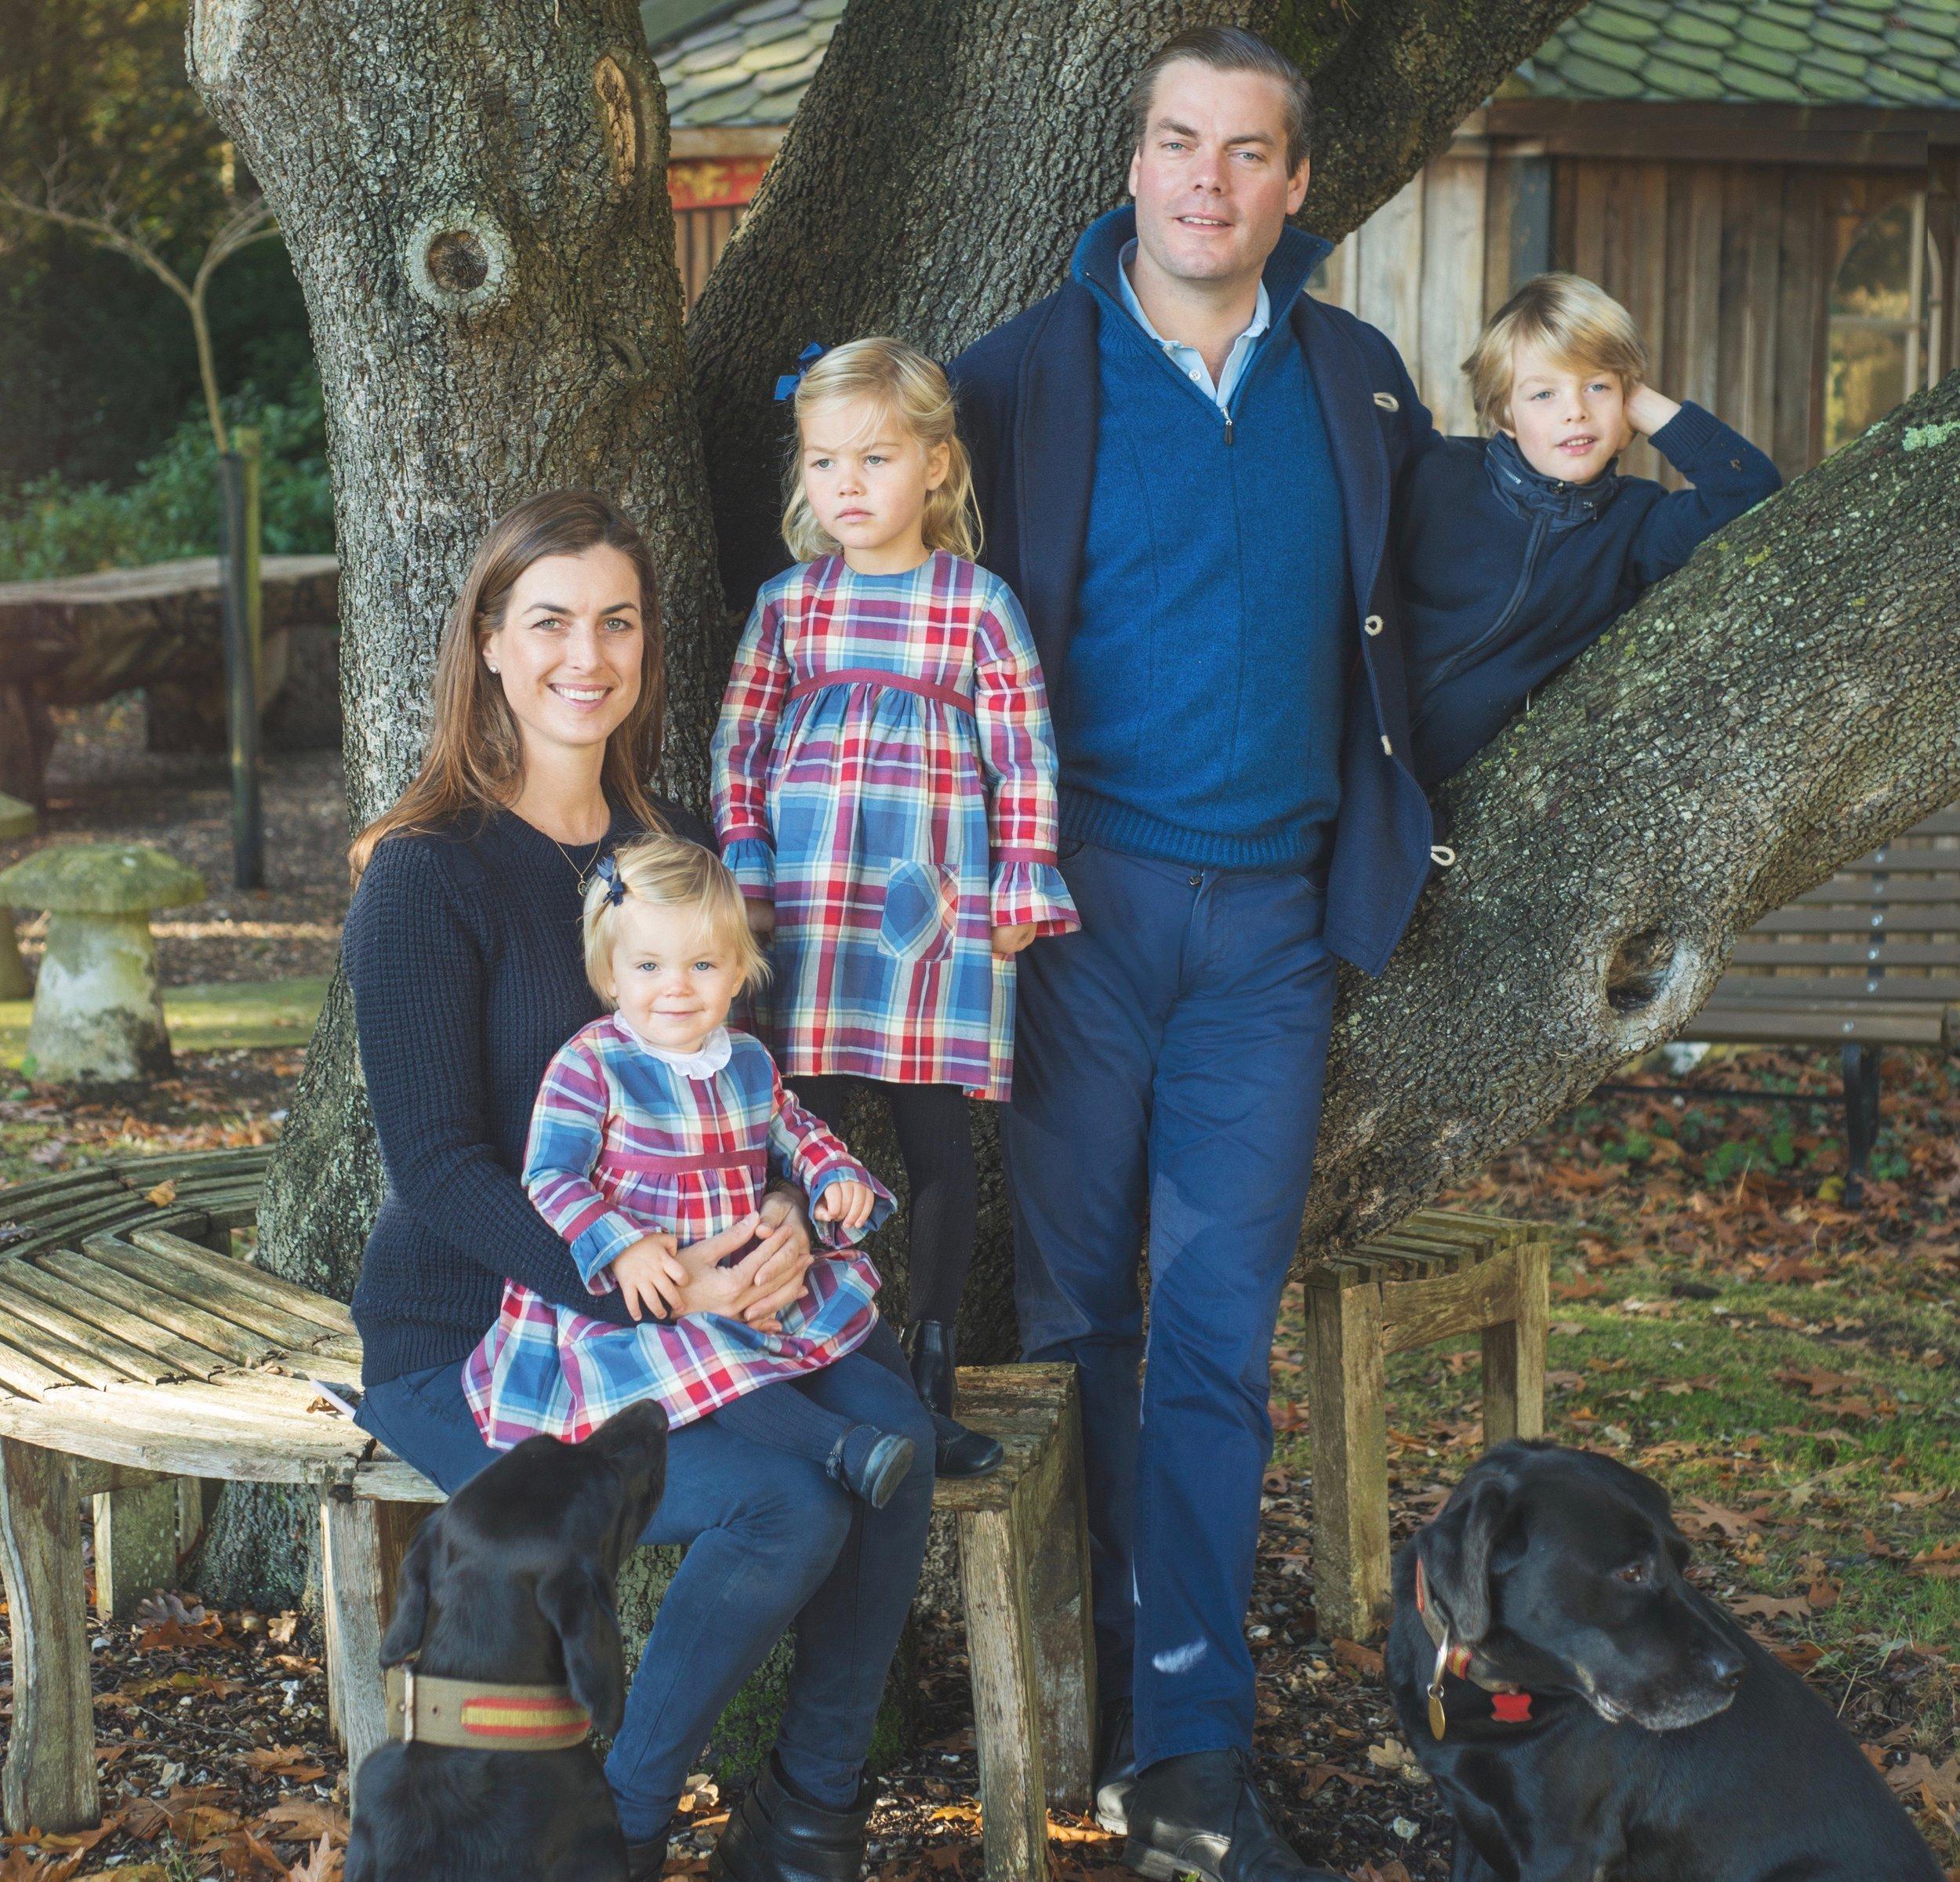 Aldred & Fiona Drummond with their children Laszlo,MELINkA and daphne